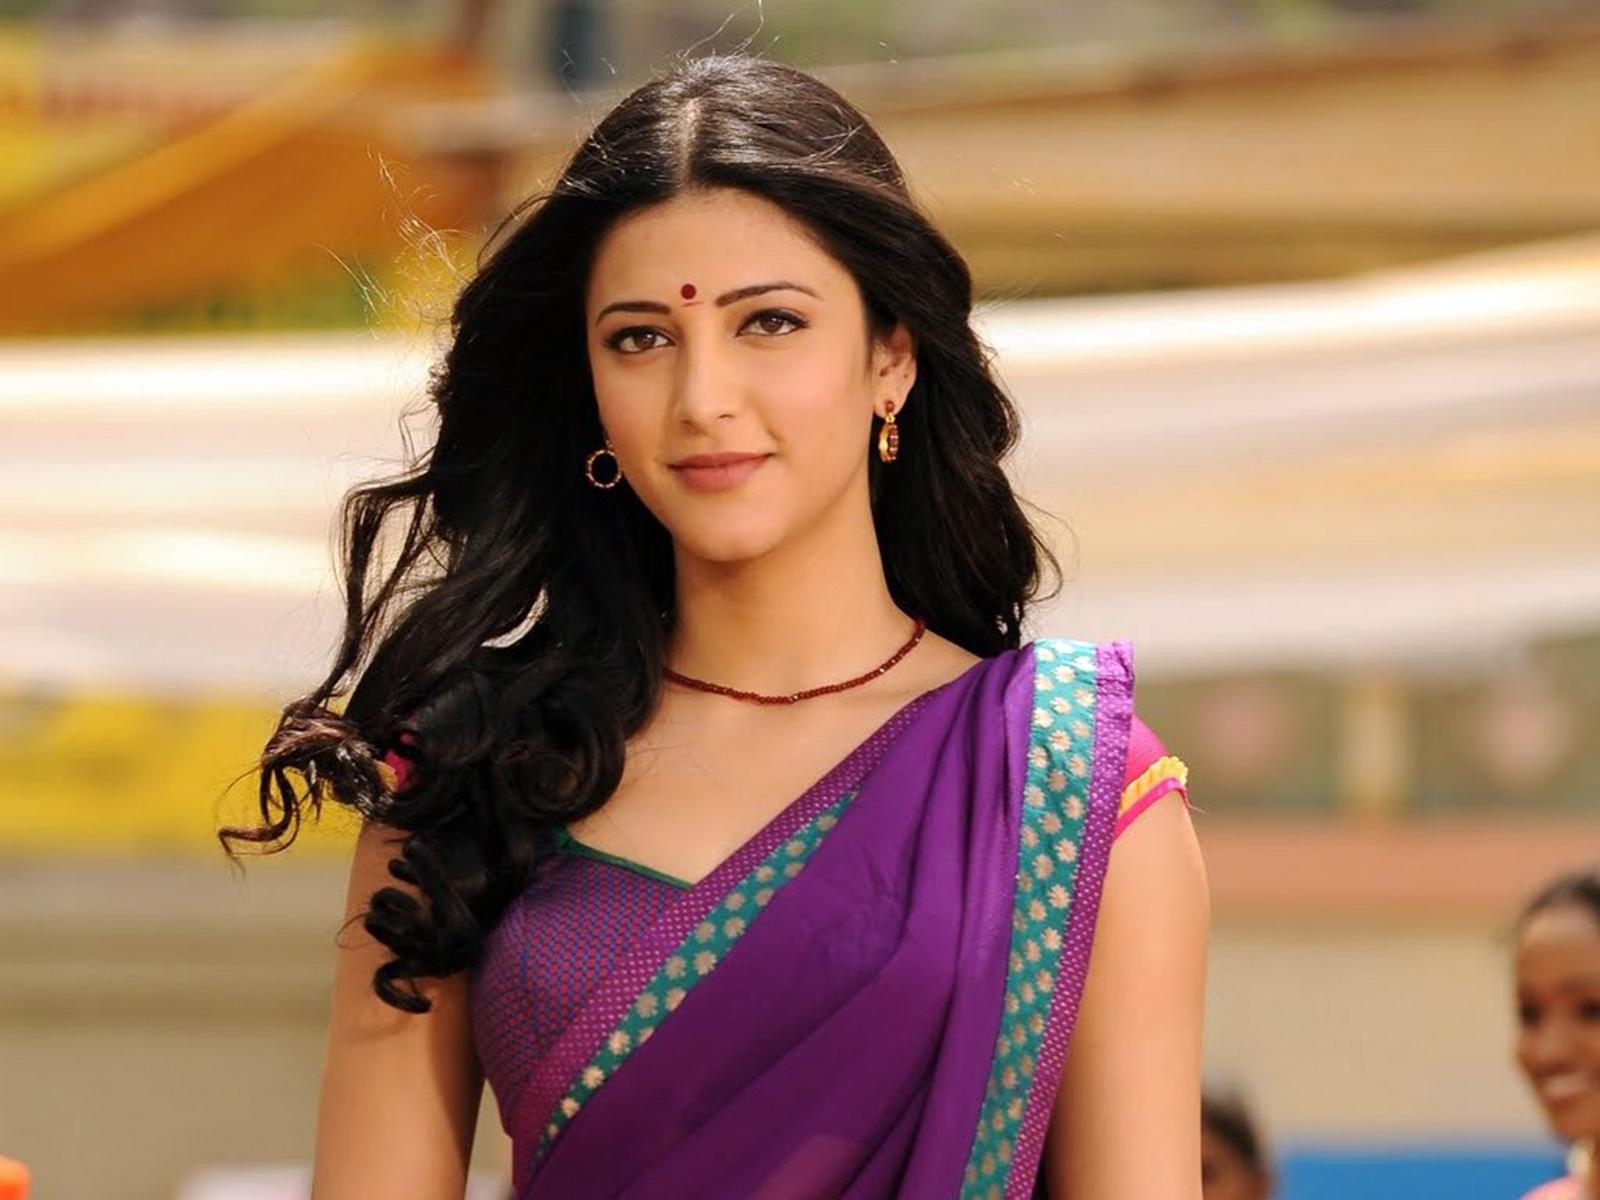 Bollywood Hd Wallpapers Bollywood Actress Wallpapers 1600x1200